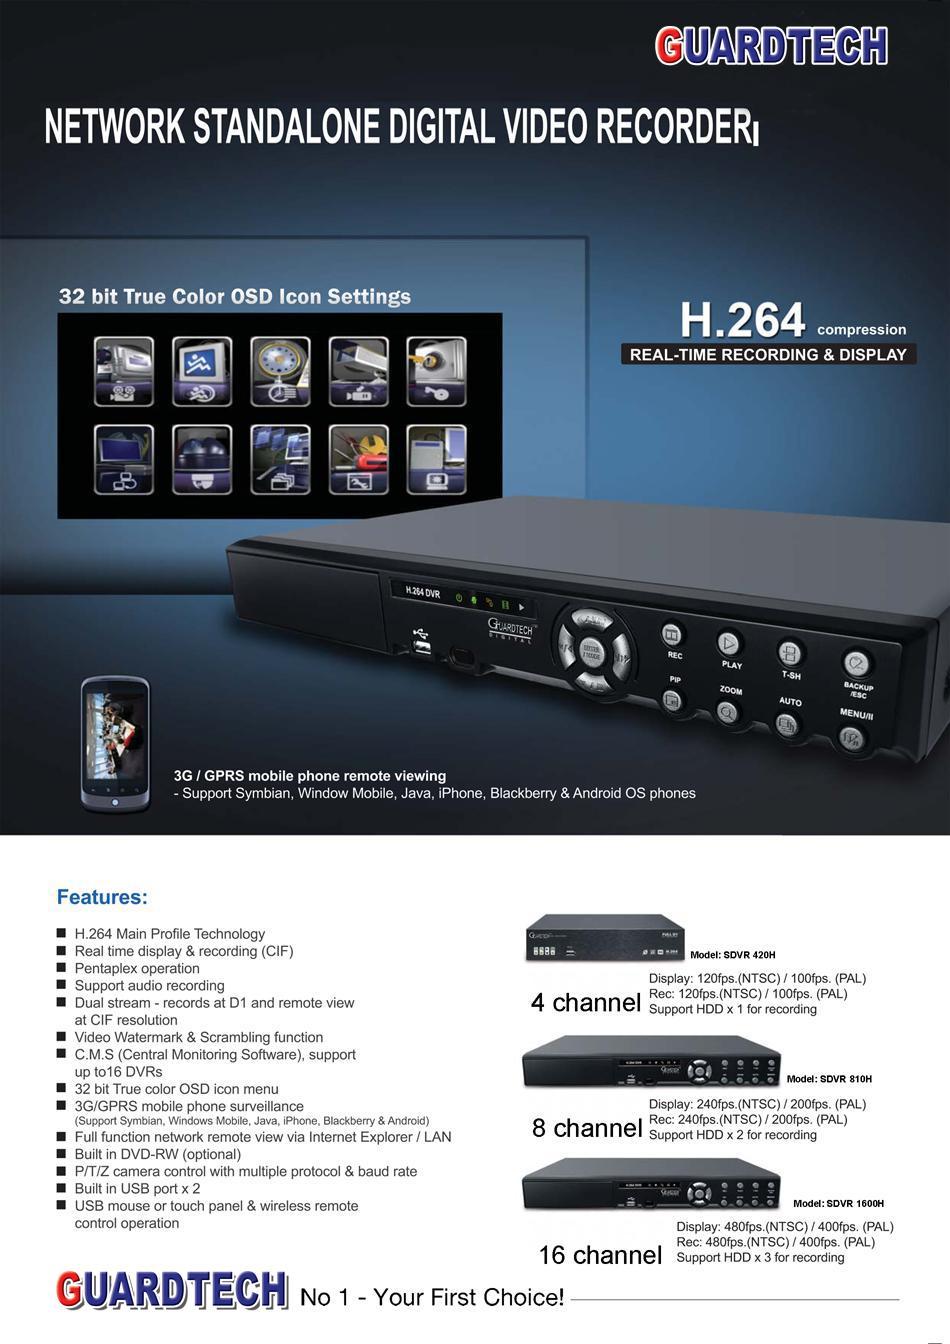 Standalone Digital Video Recording 810H (8 Channel)